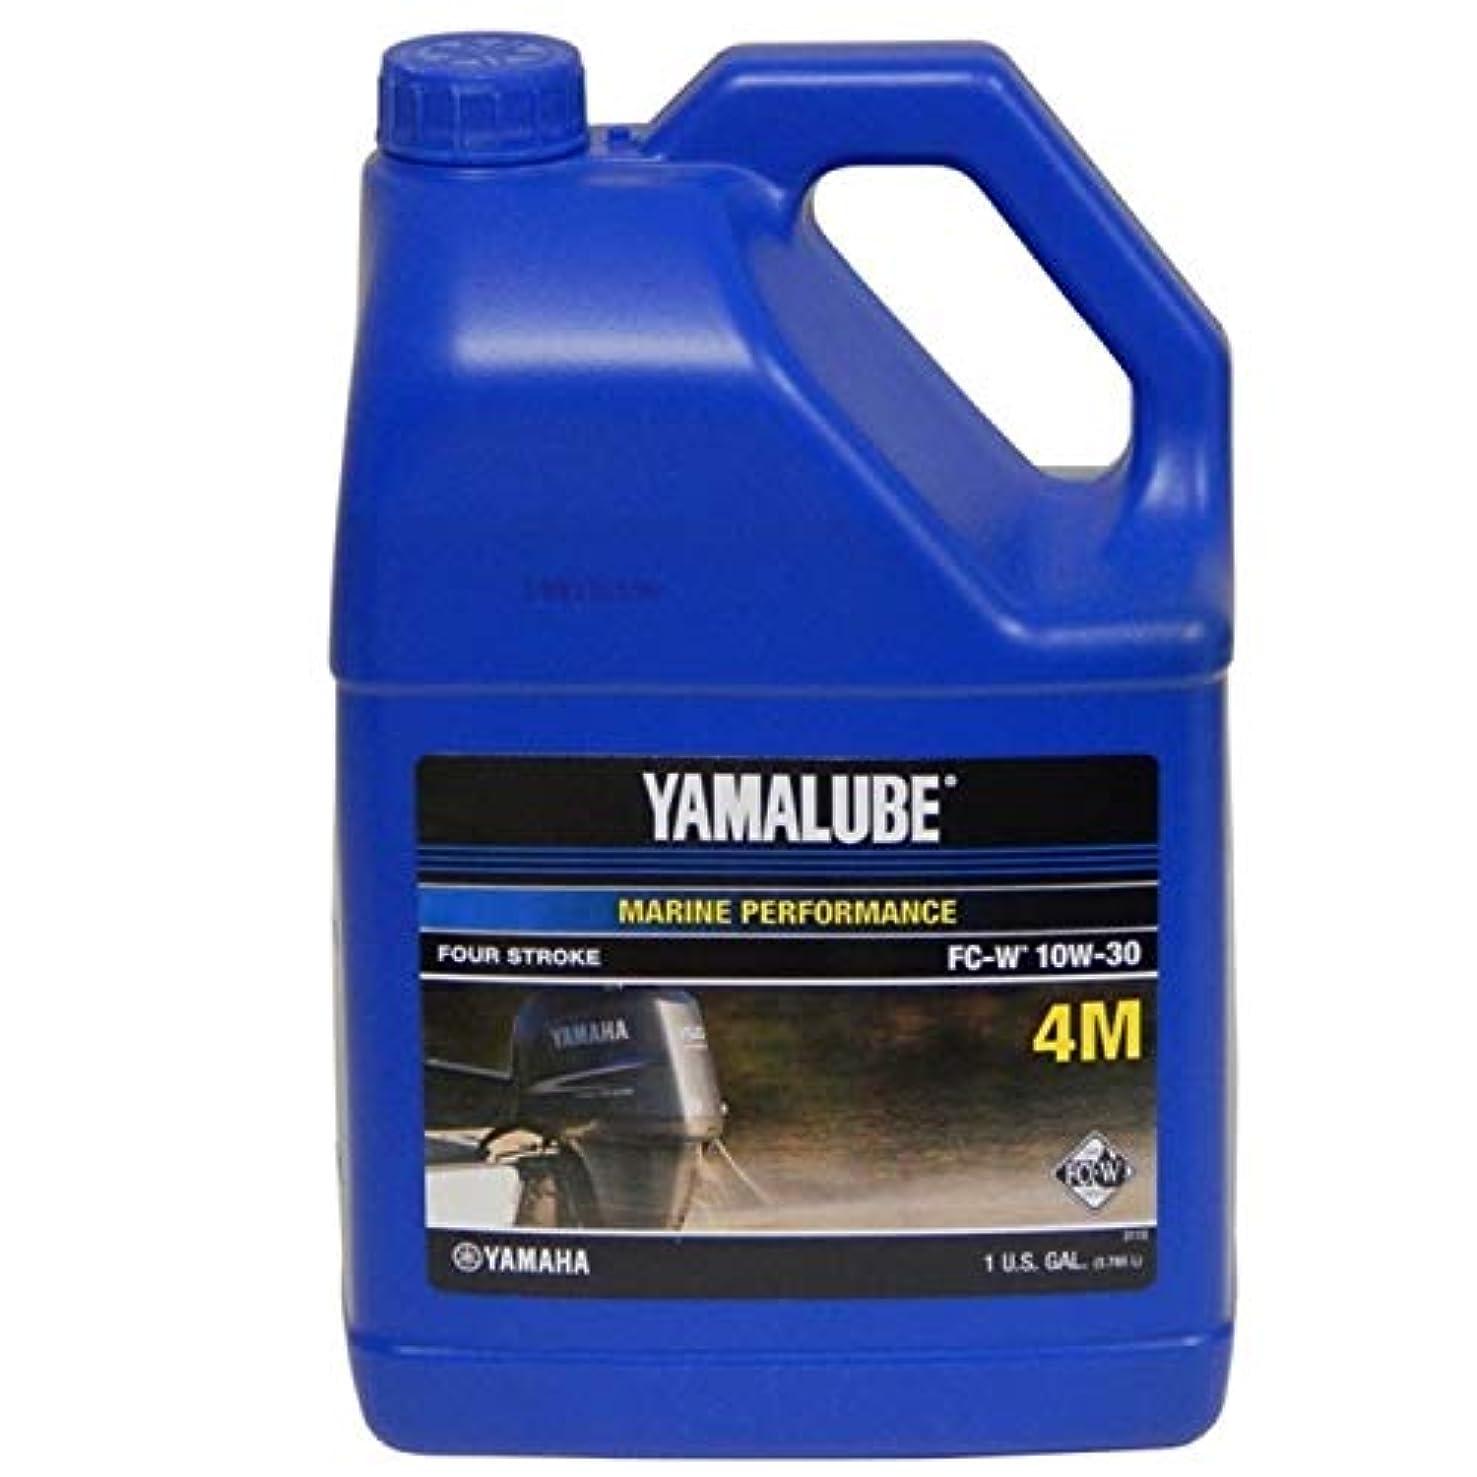 Yamaha LUB-10W30-FC-04 Yamalube 10W30 MARINE Oil NMMA FCW (Low Phosphorous) Gallon; LUB10W30FC04 Made by Yamaha